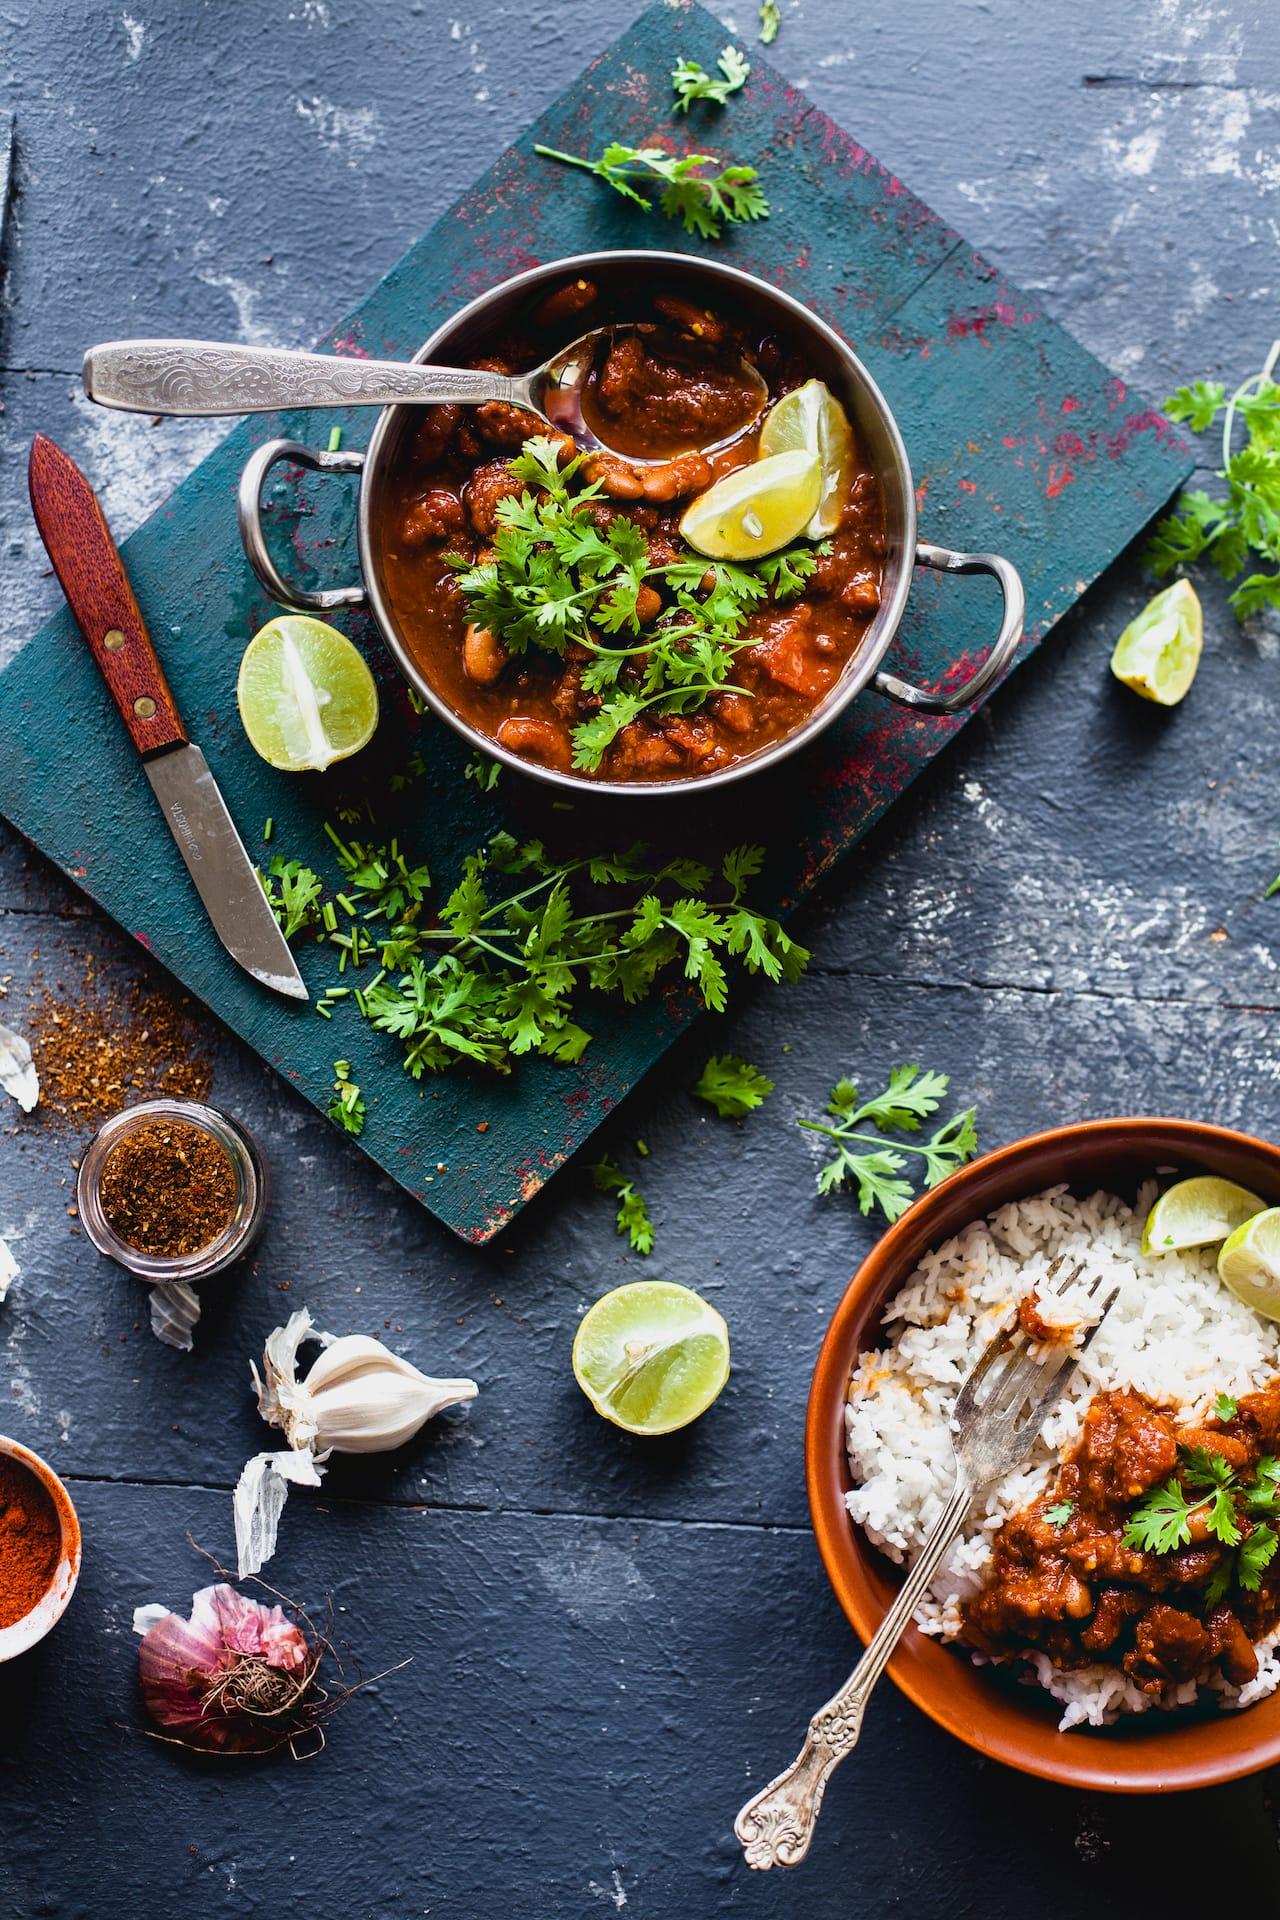 Rajma Masala (Red Kidney Beans Stew) | Playful Cooking